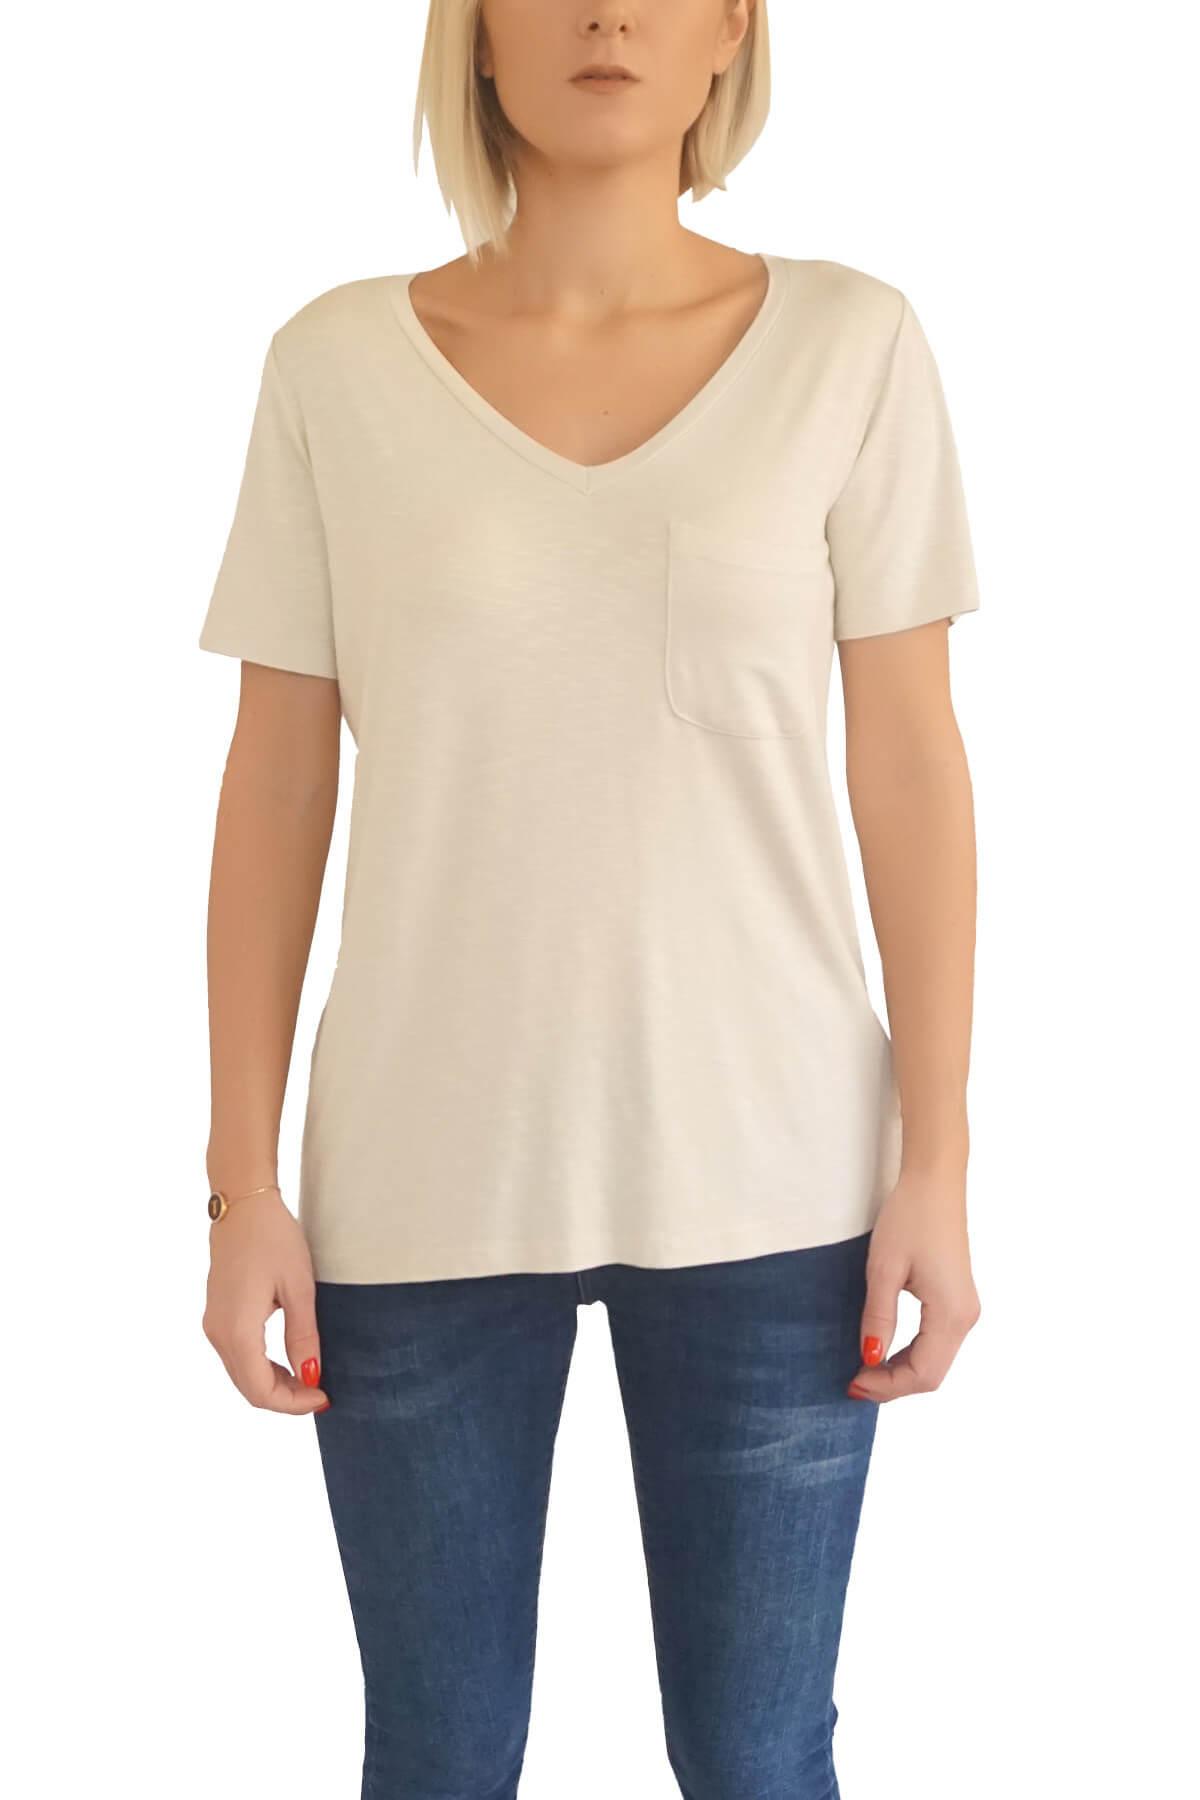 MOF Kadın Taş T-Shirt VYCT-T 1